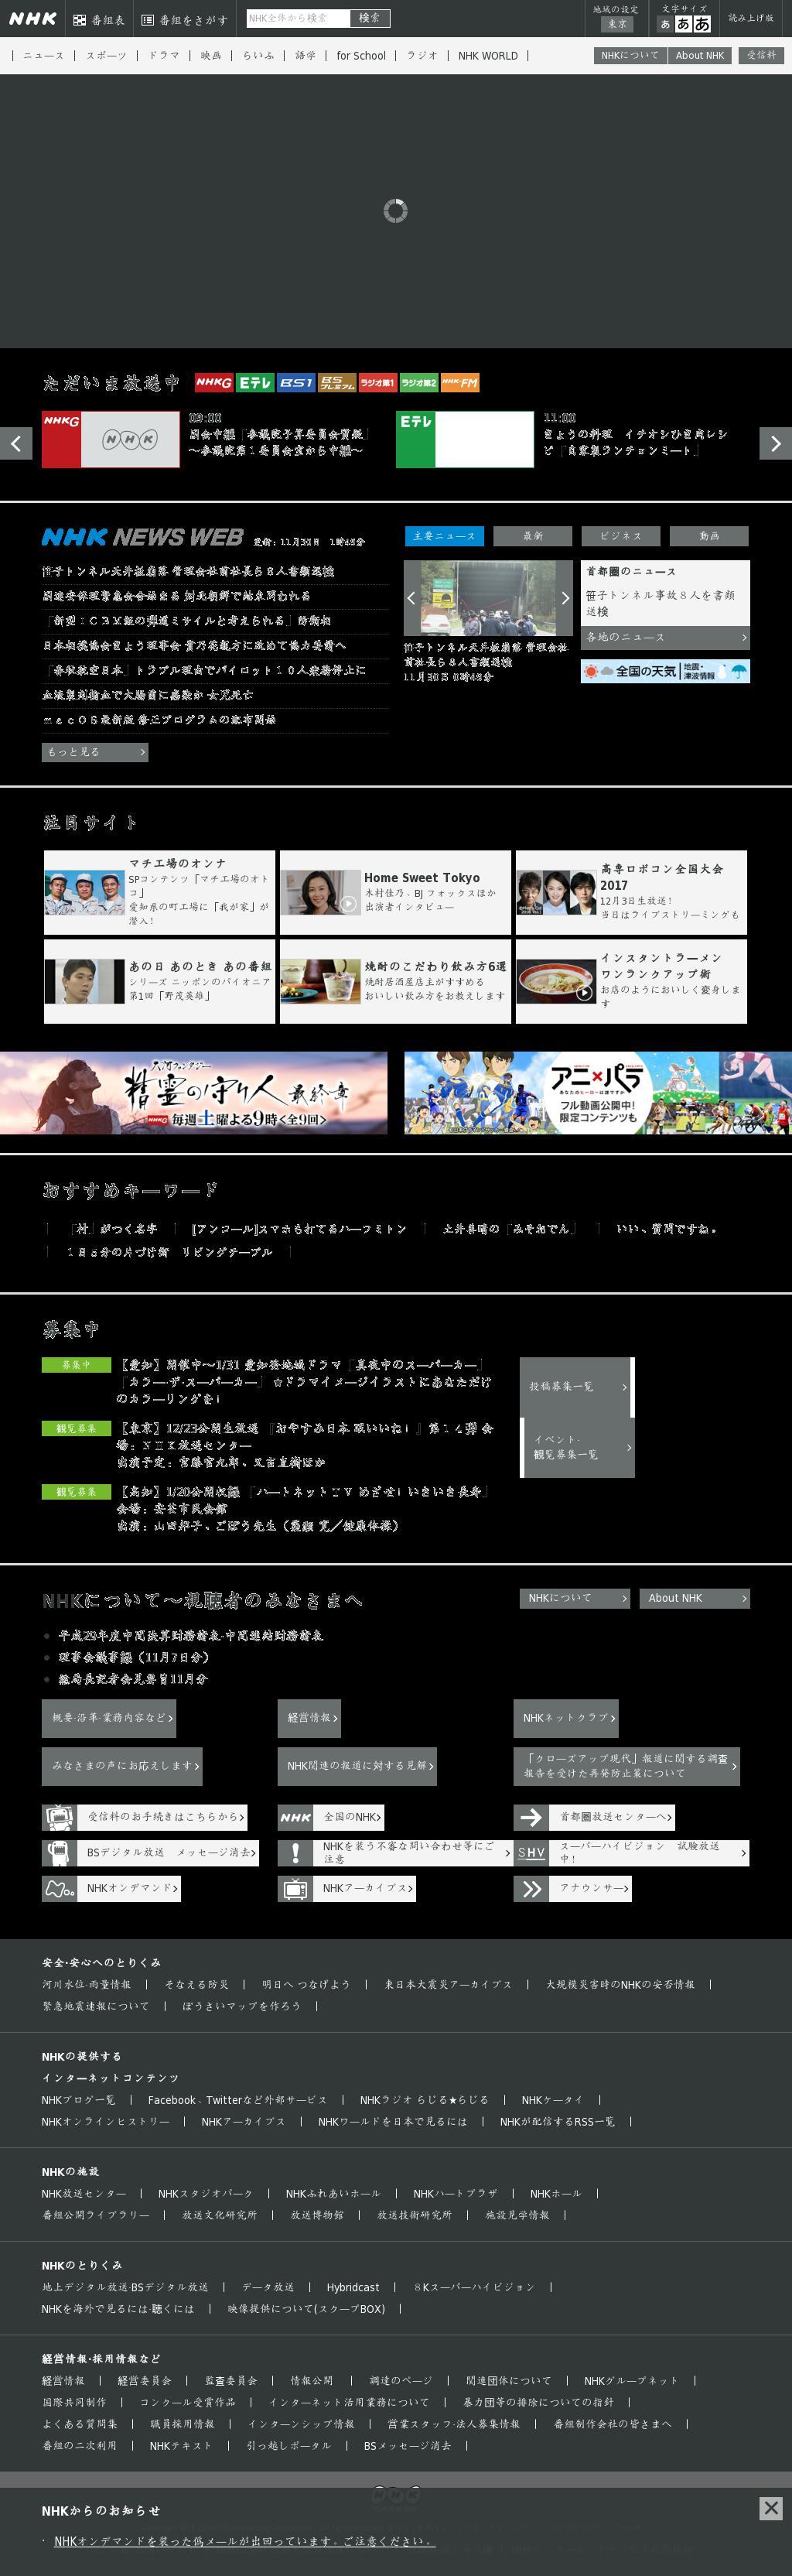 NHK Online at Sunday Jan. 7, 2018, 8:14 p.m. UTC